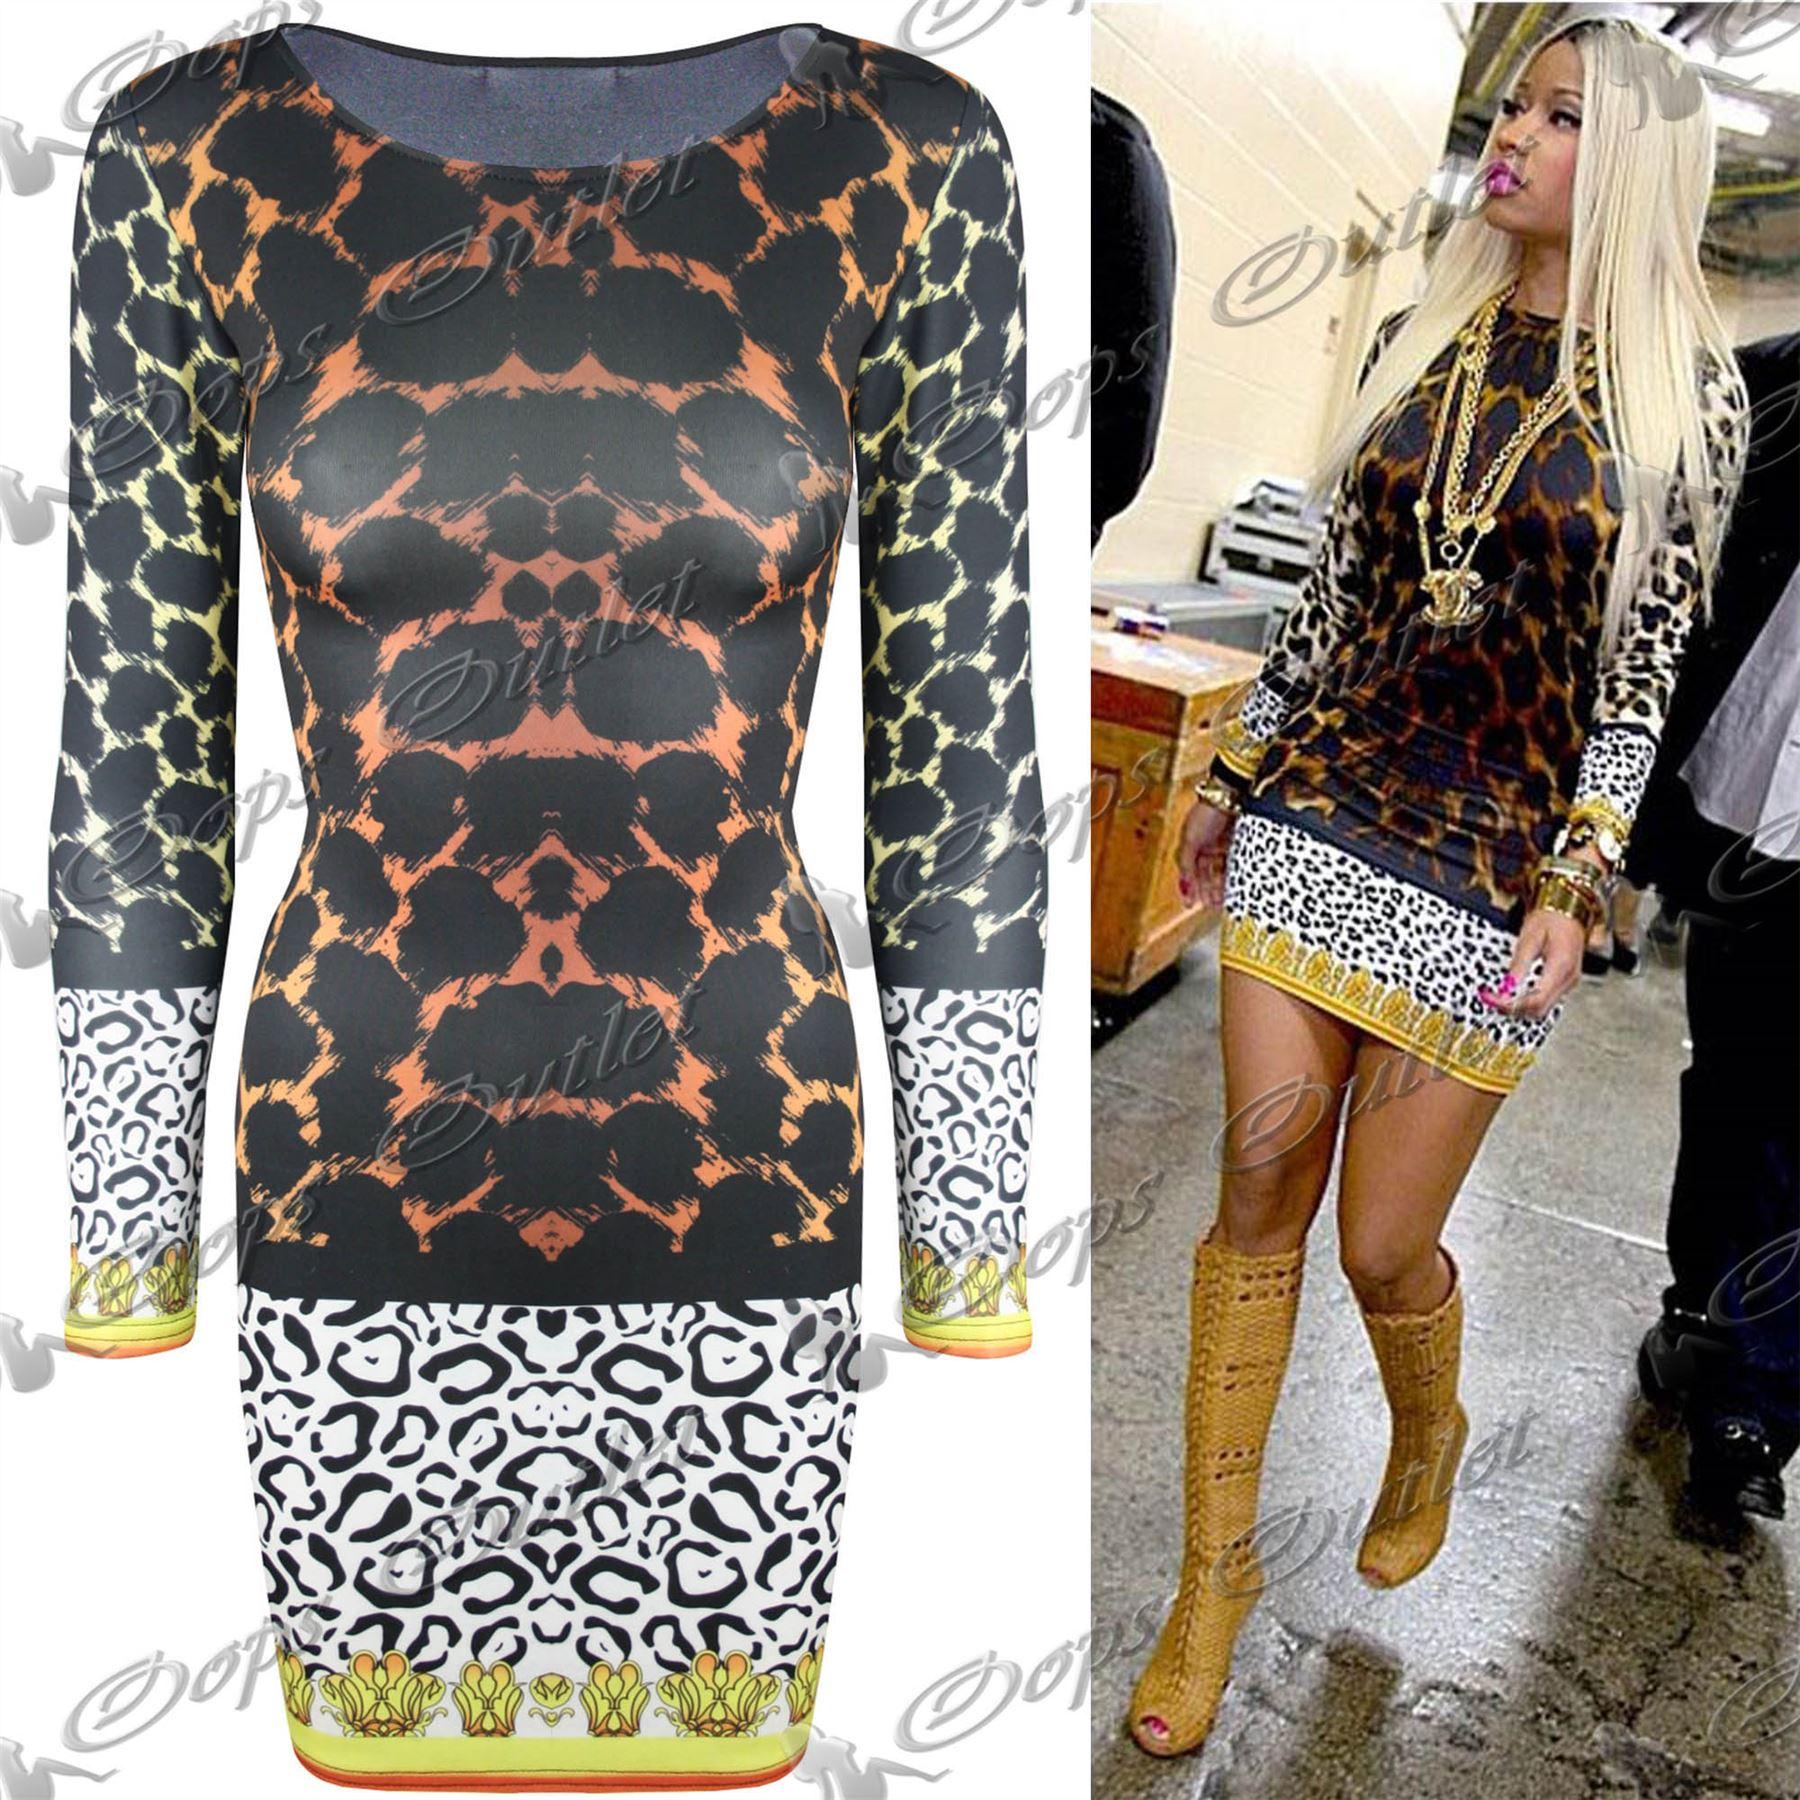 New Womens Ladies Celeb Nicki Minaj Bodycon Dress Tiger ...Nicki Minaj In Leopard Print